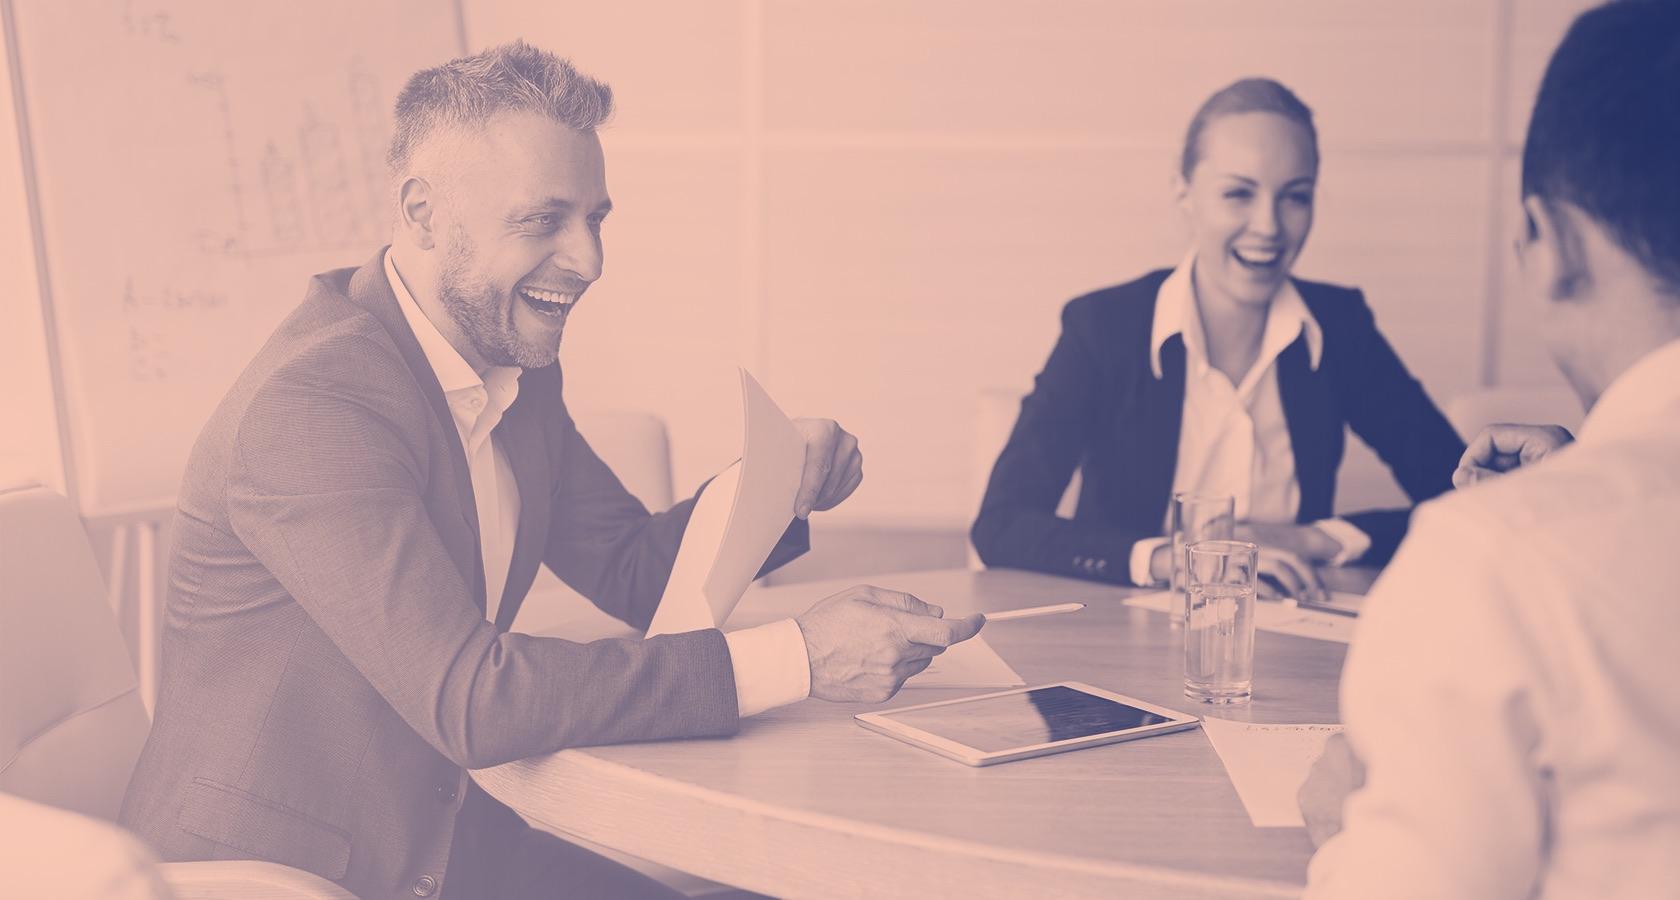 Distanskurs HR Human resources